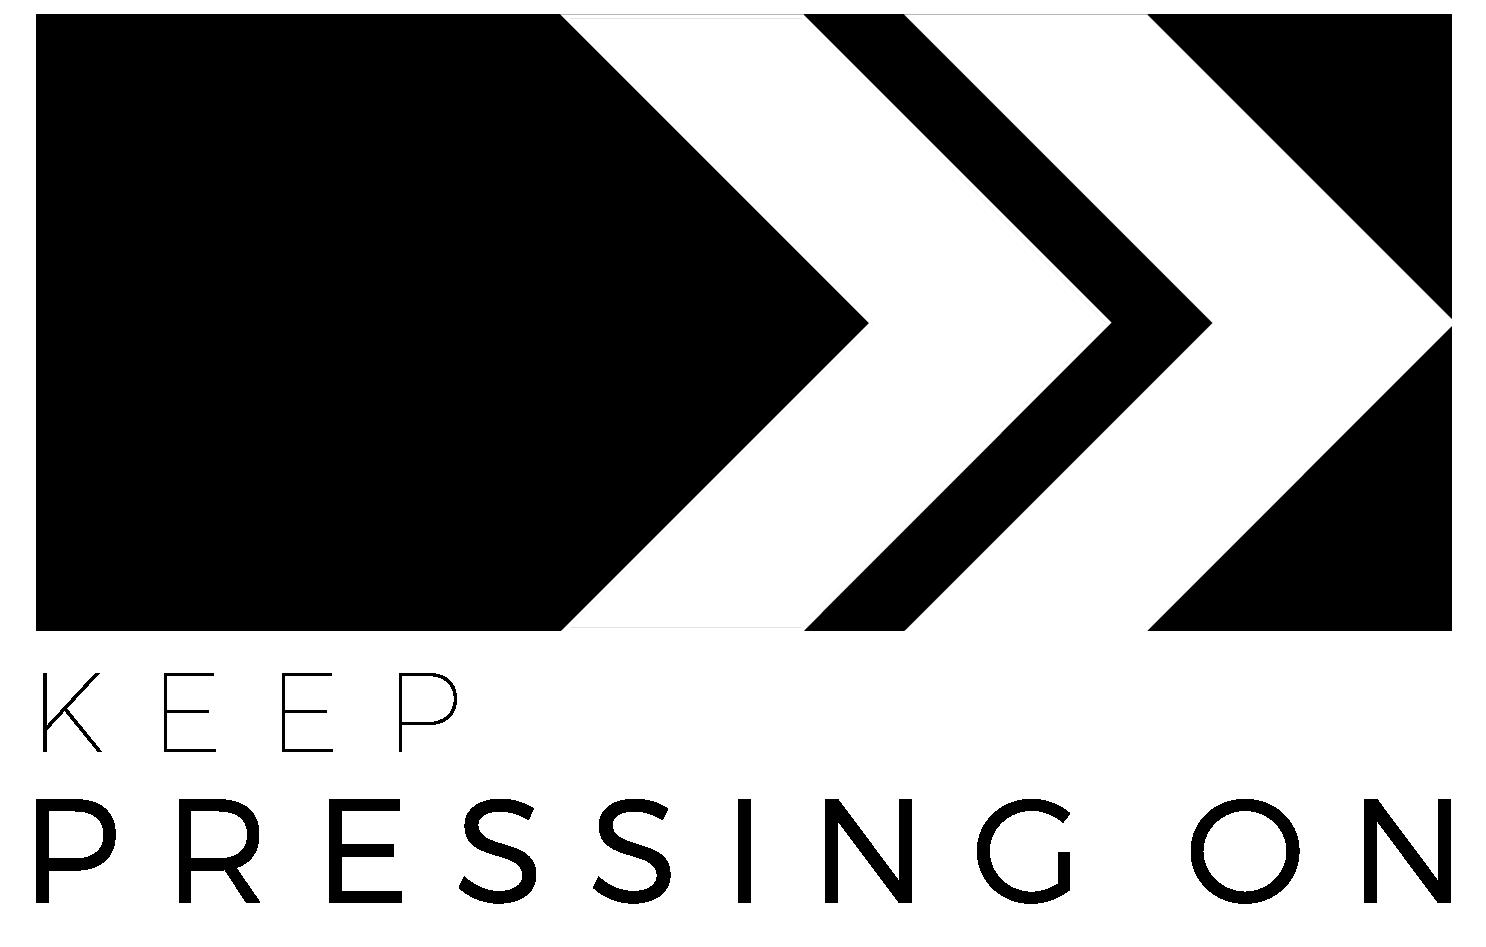 kpo block txt-05.png